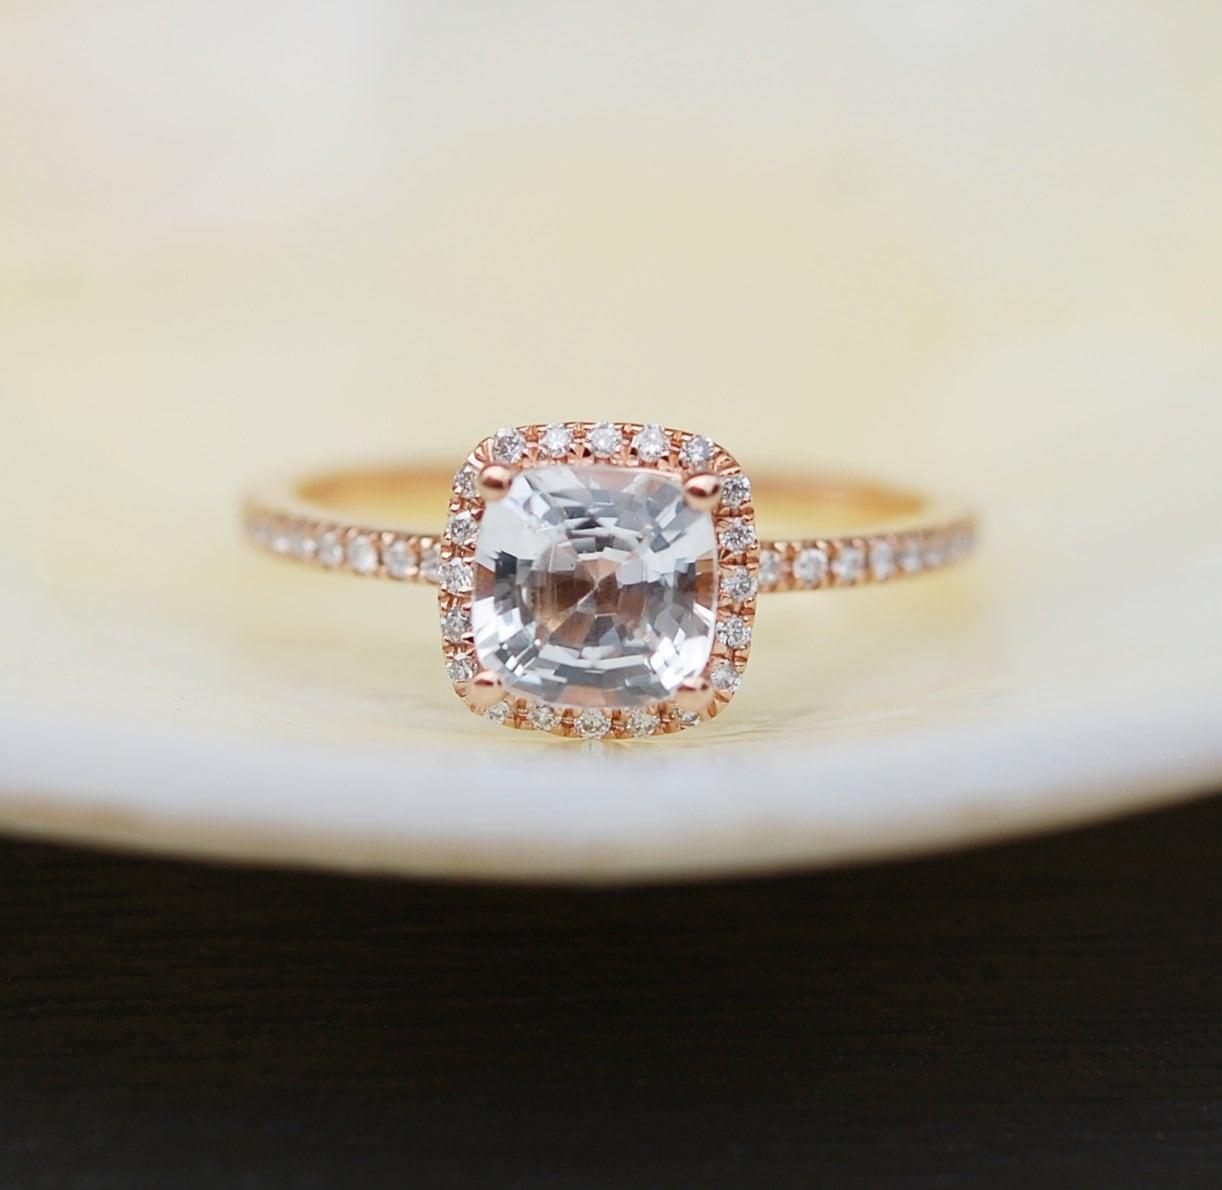 White Sapphire Ring Engagement Ring Square Cushion 14k Rose Gold Diamond  Ring 116ct Sapphire Ring By Eidelprecious